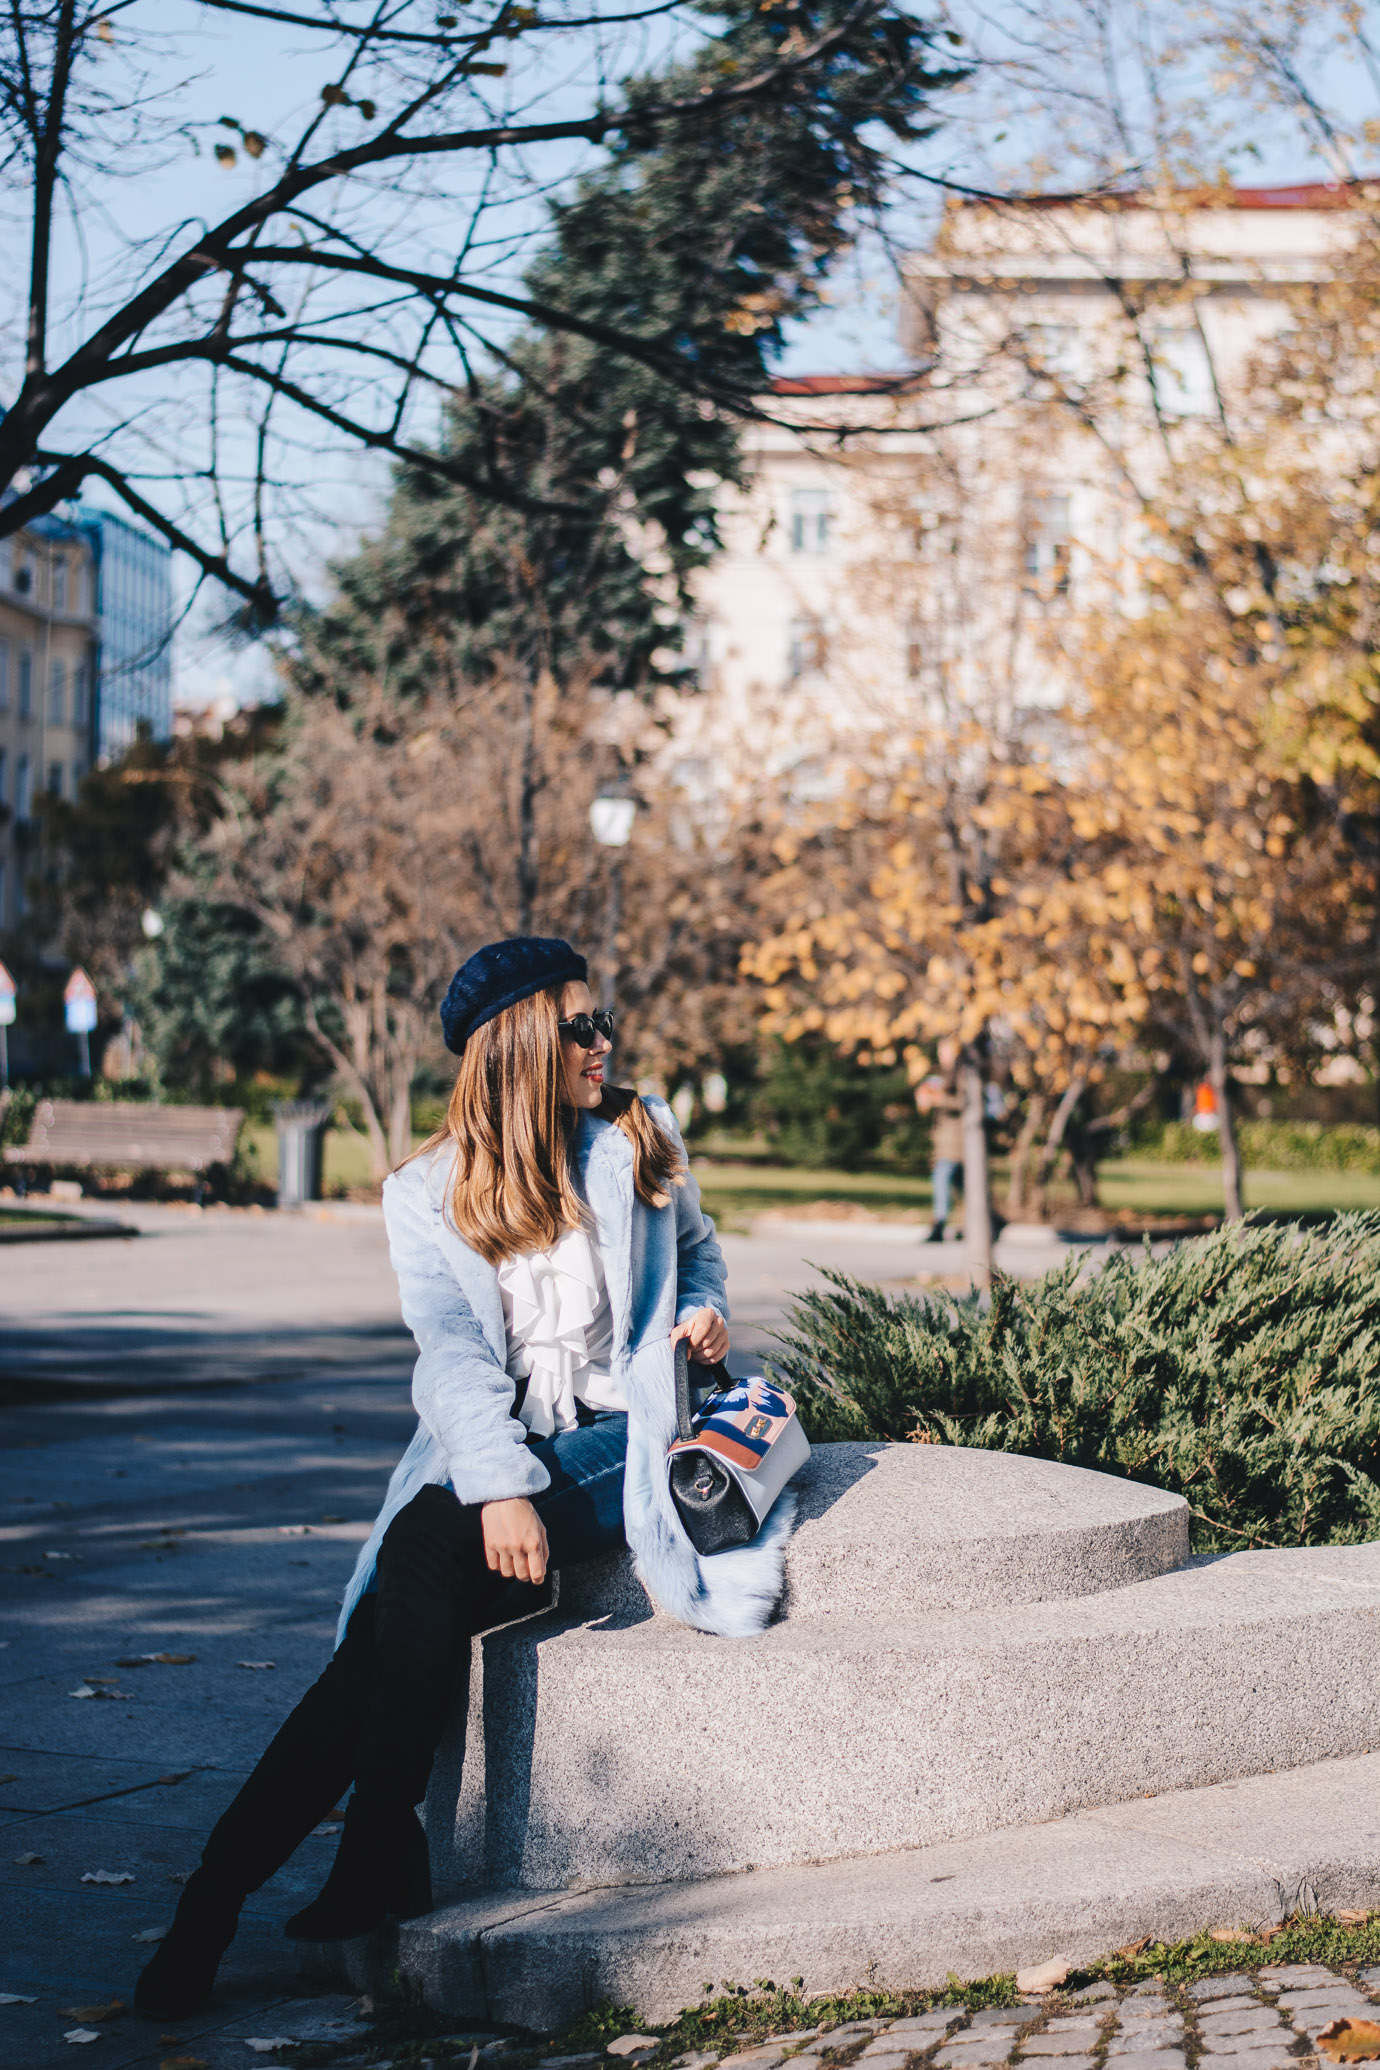 Autumn style blue coat